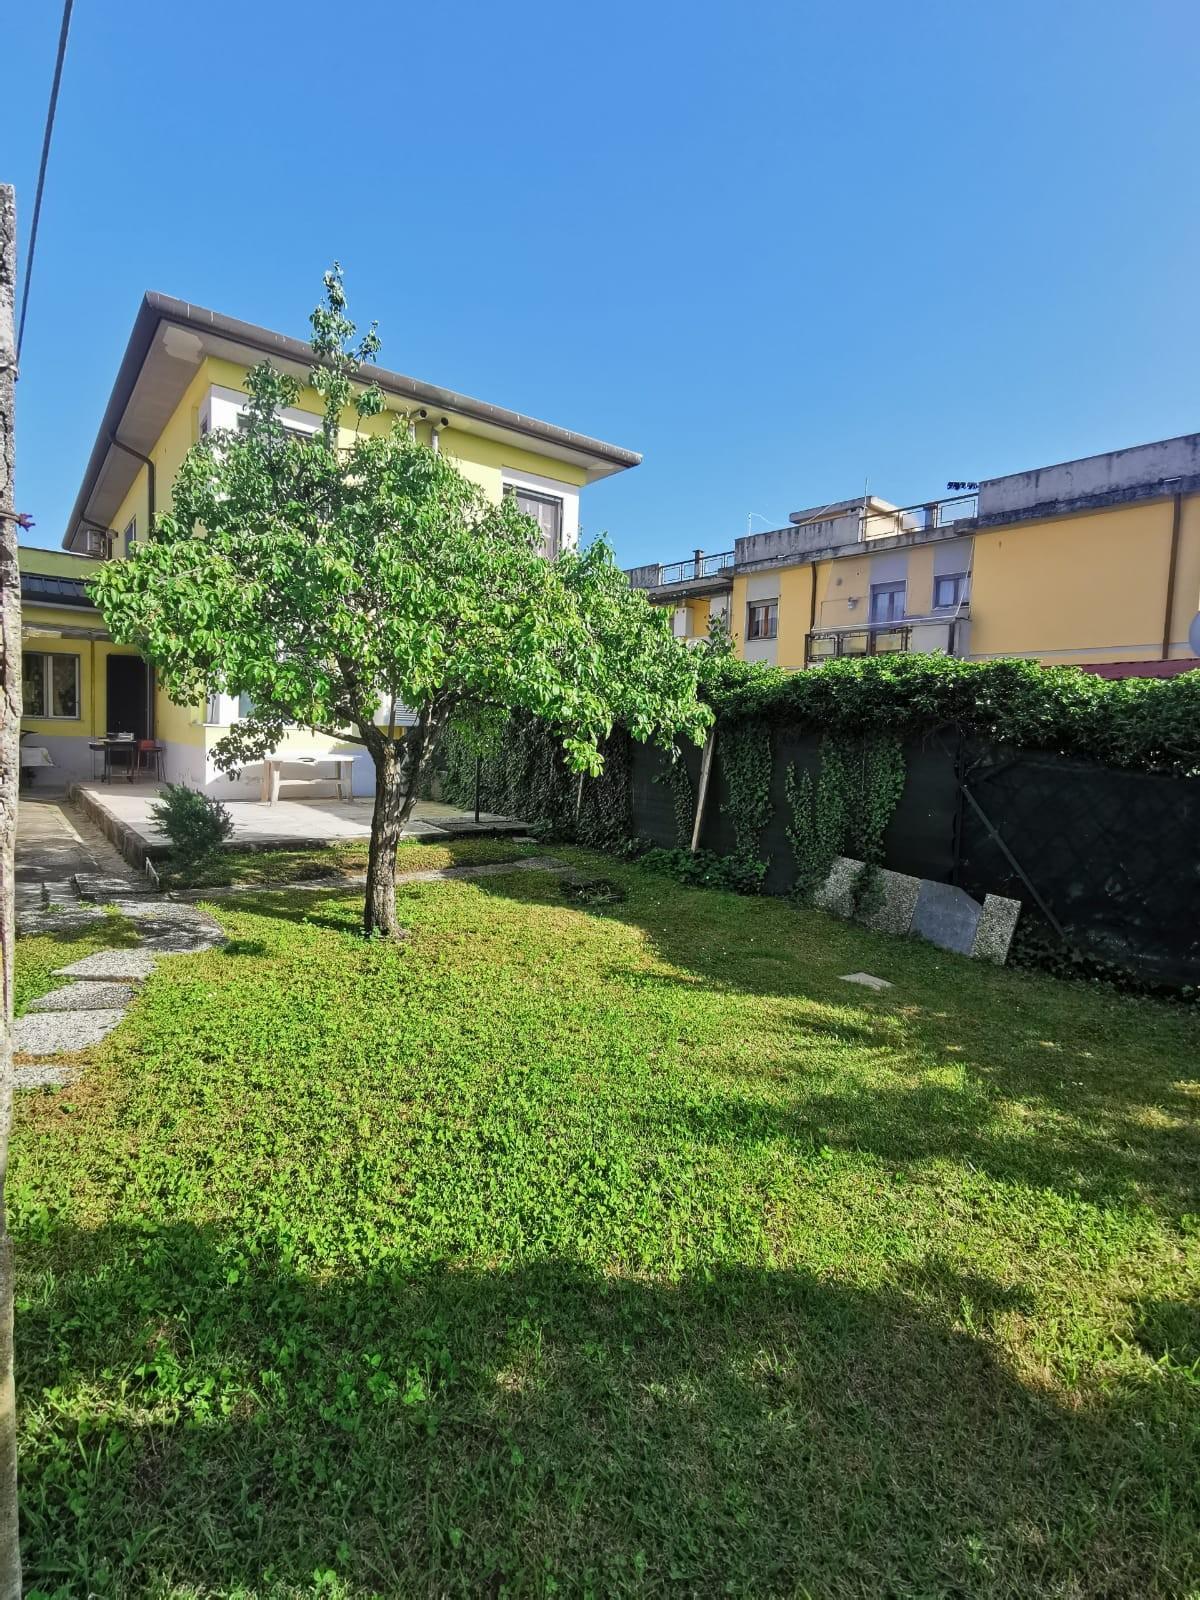 Casa singola in affitto vacanze a Carrara (MS)